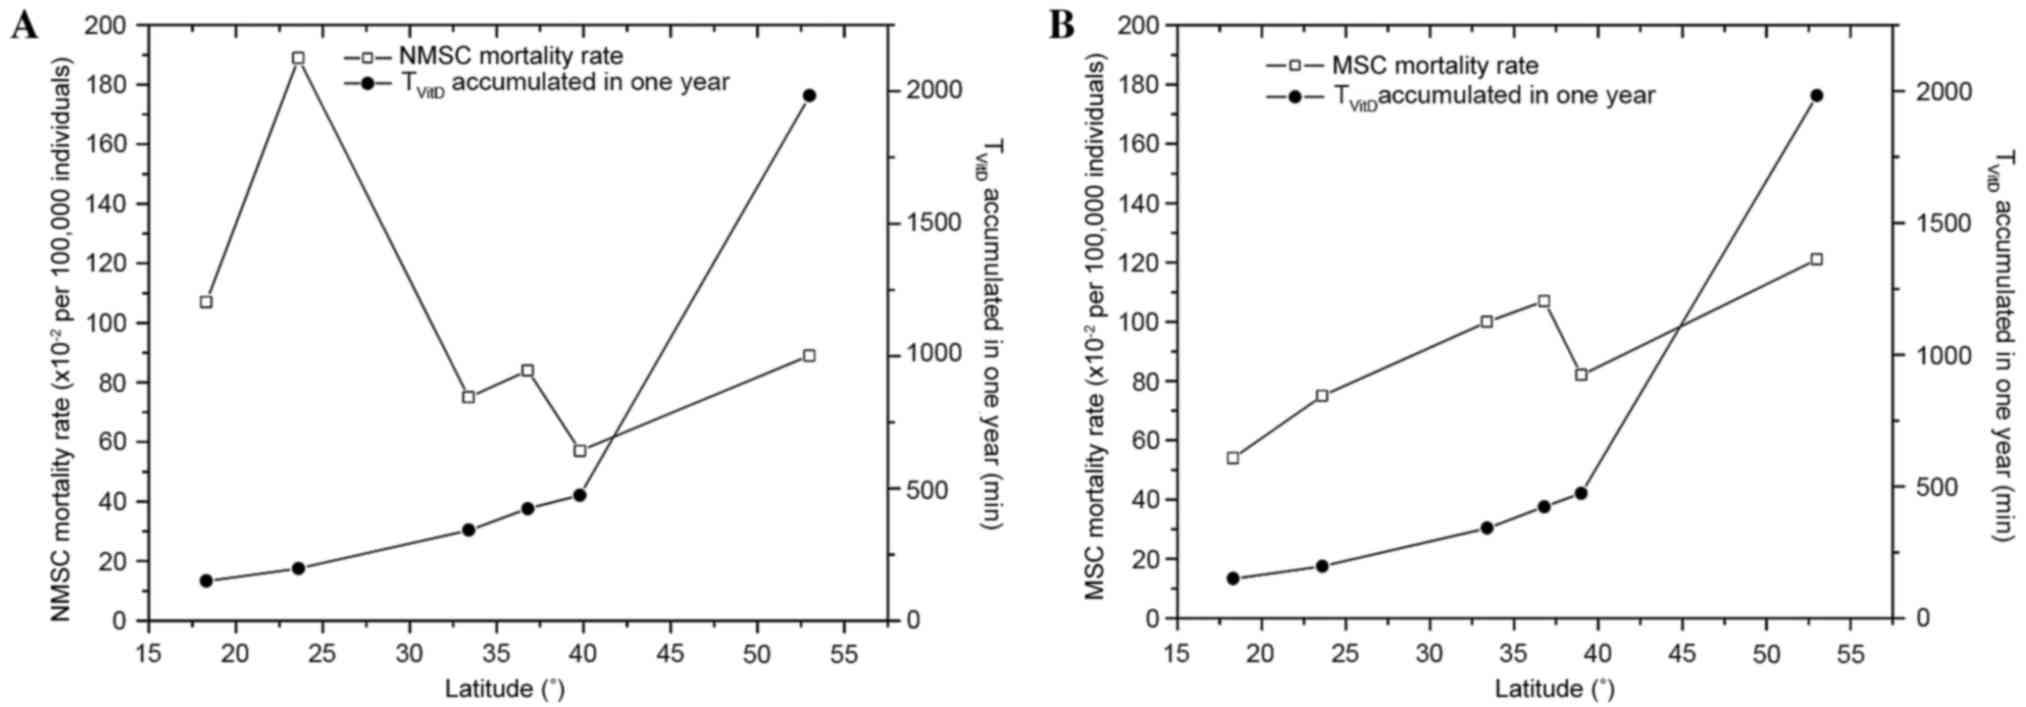 Association Between Non Melanoma And Melanoma Skin Cancer Rates Vitamin D And Latitude